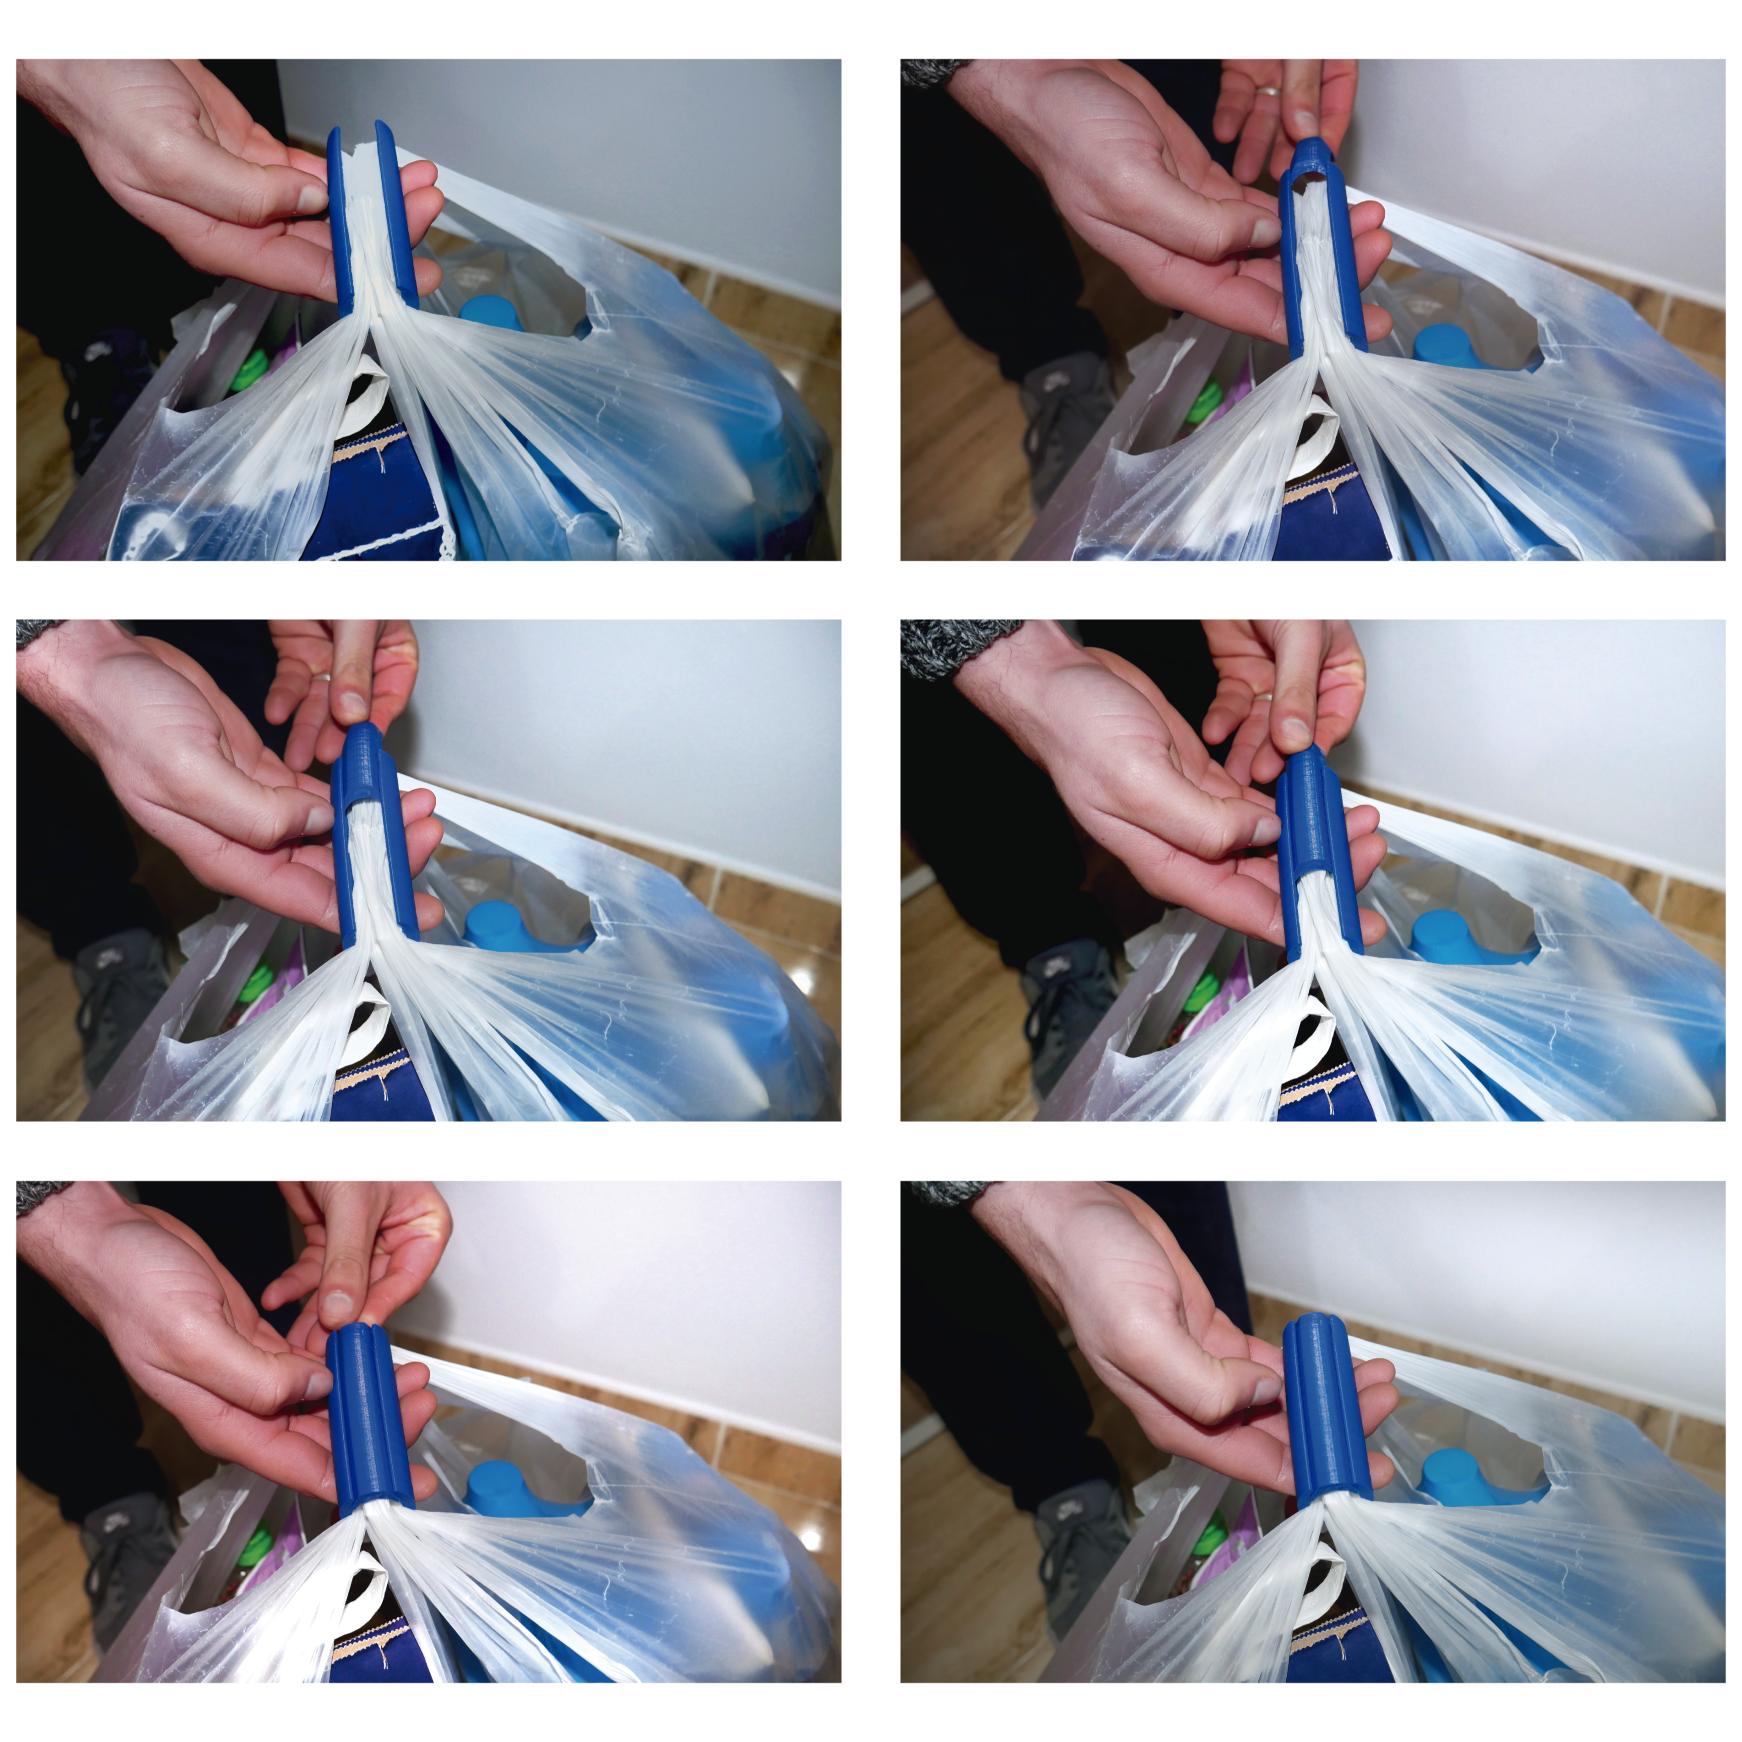 Shopping_bag_handle_06.png Download STL file Shopping Bag Handle [Life Hack] • 3D print design, 3DKSTRO